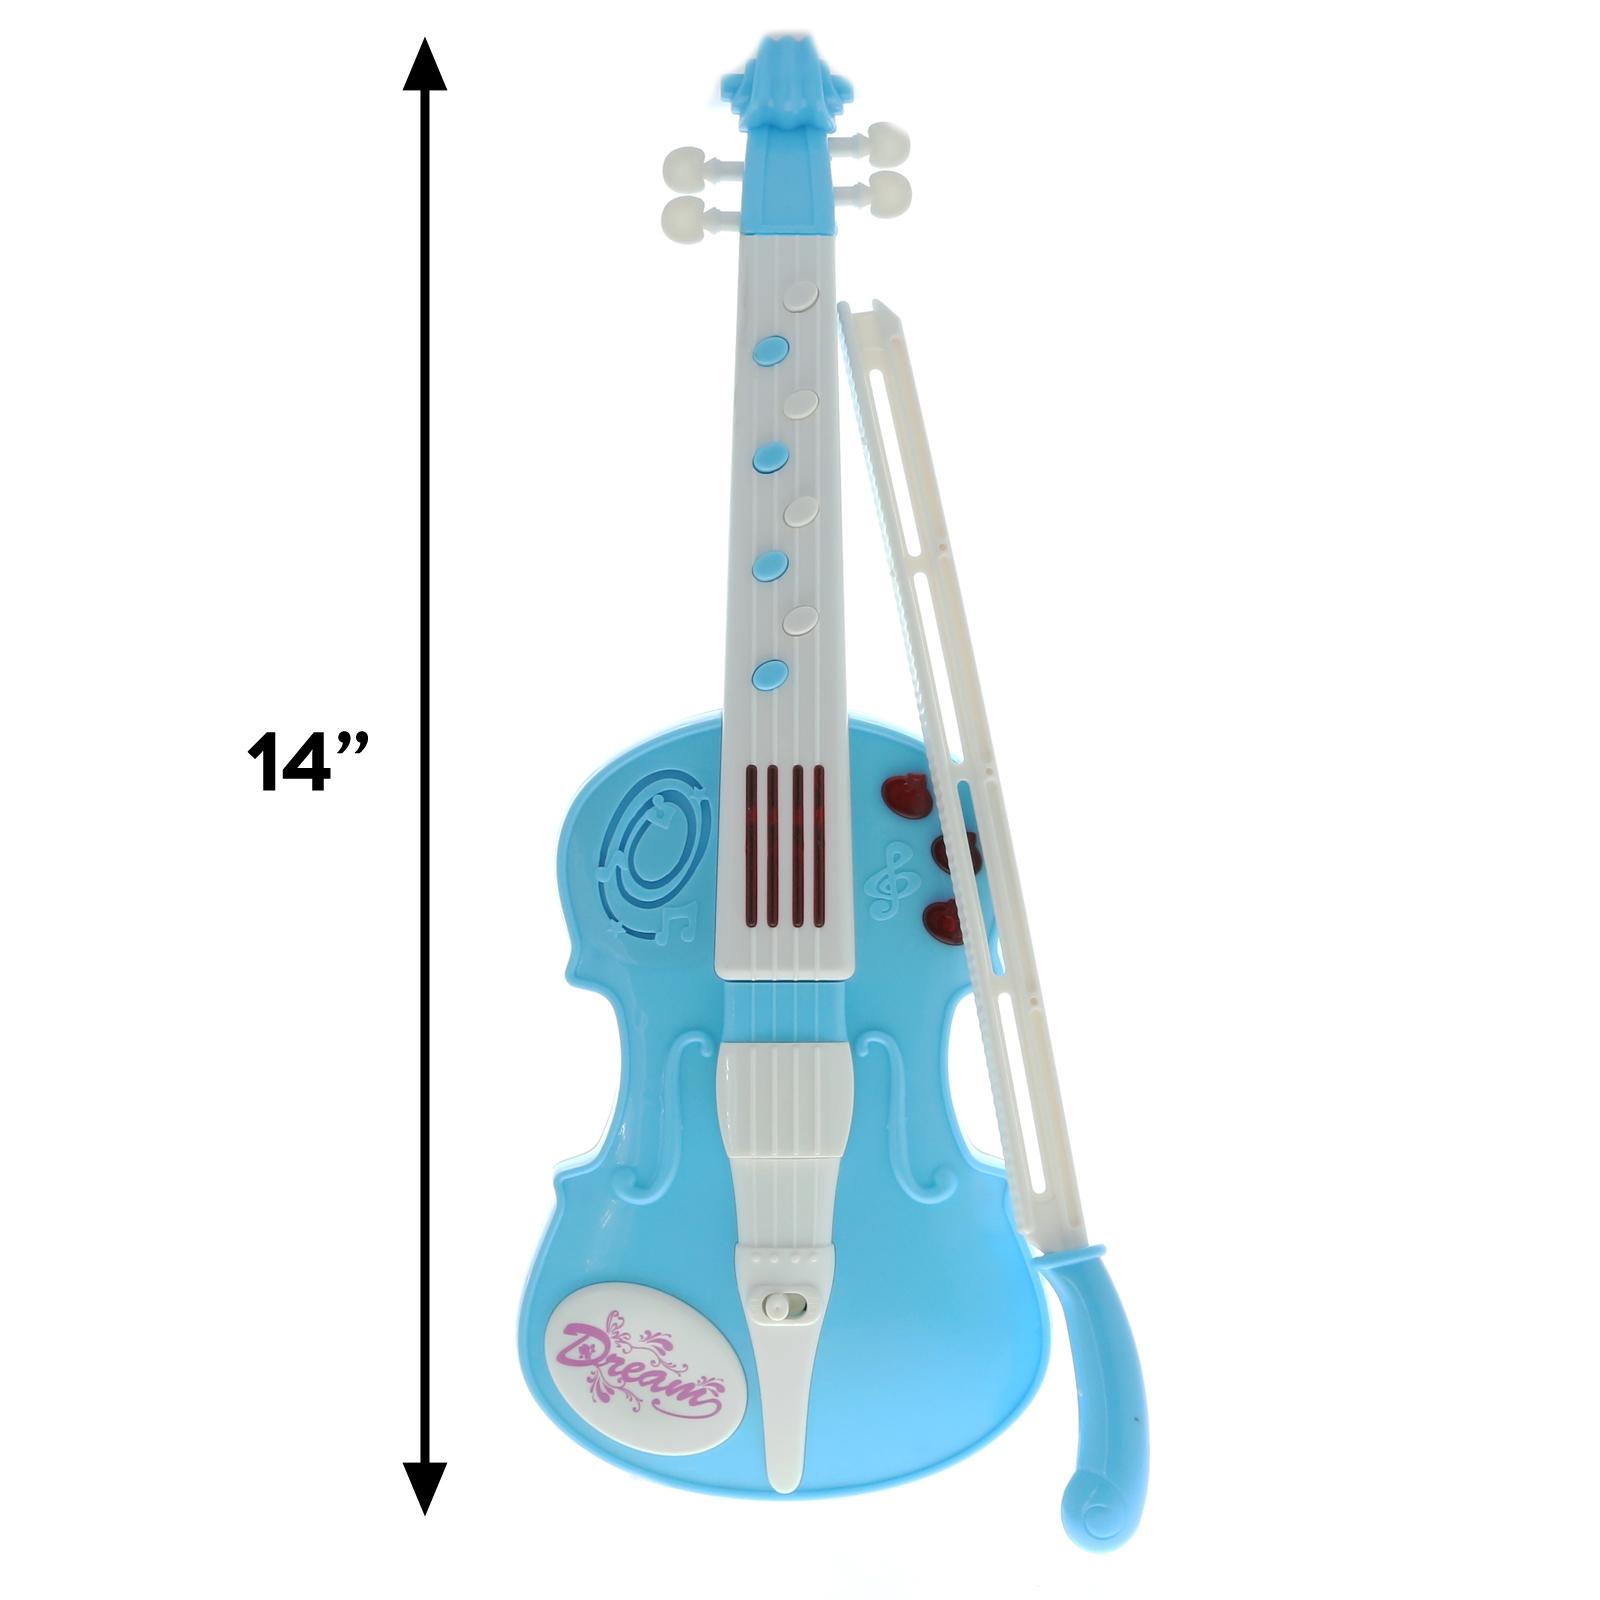 KidPlay Musical Violin Instrument Pretend Play Kids Light Up Toy - Blue